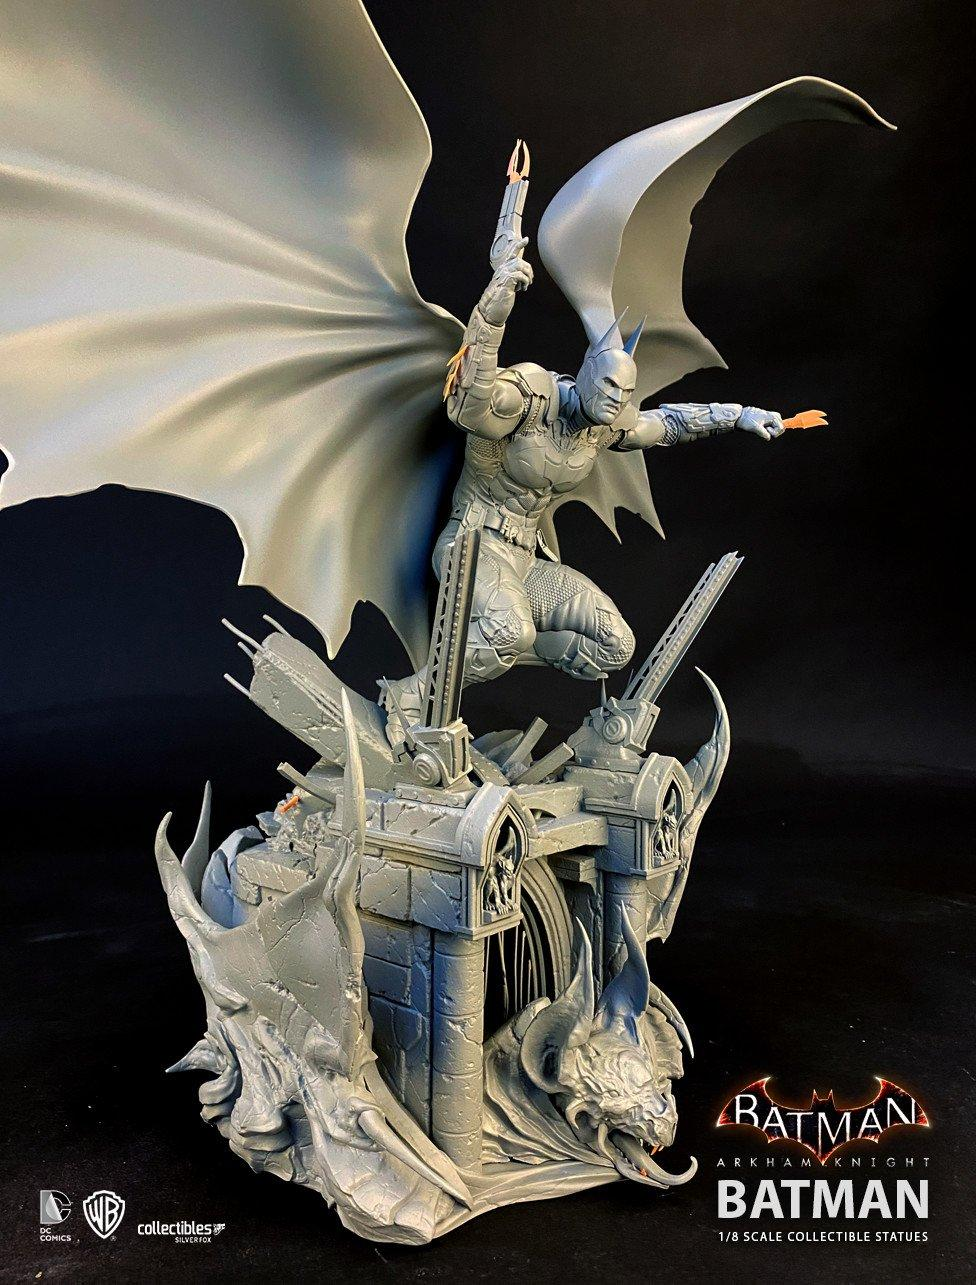 Batman siver fox collectibles batman arkham knight 1 8 scale statue2